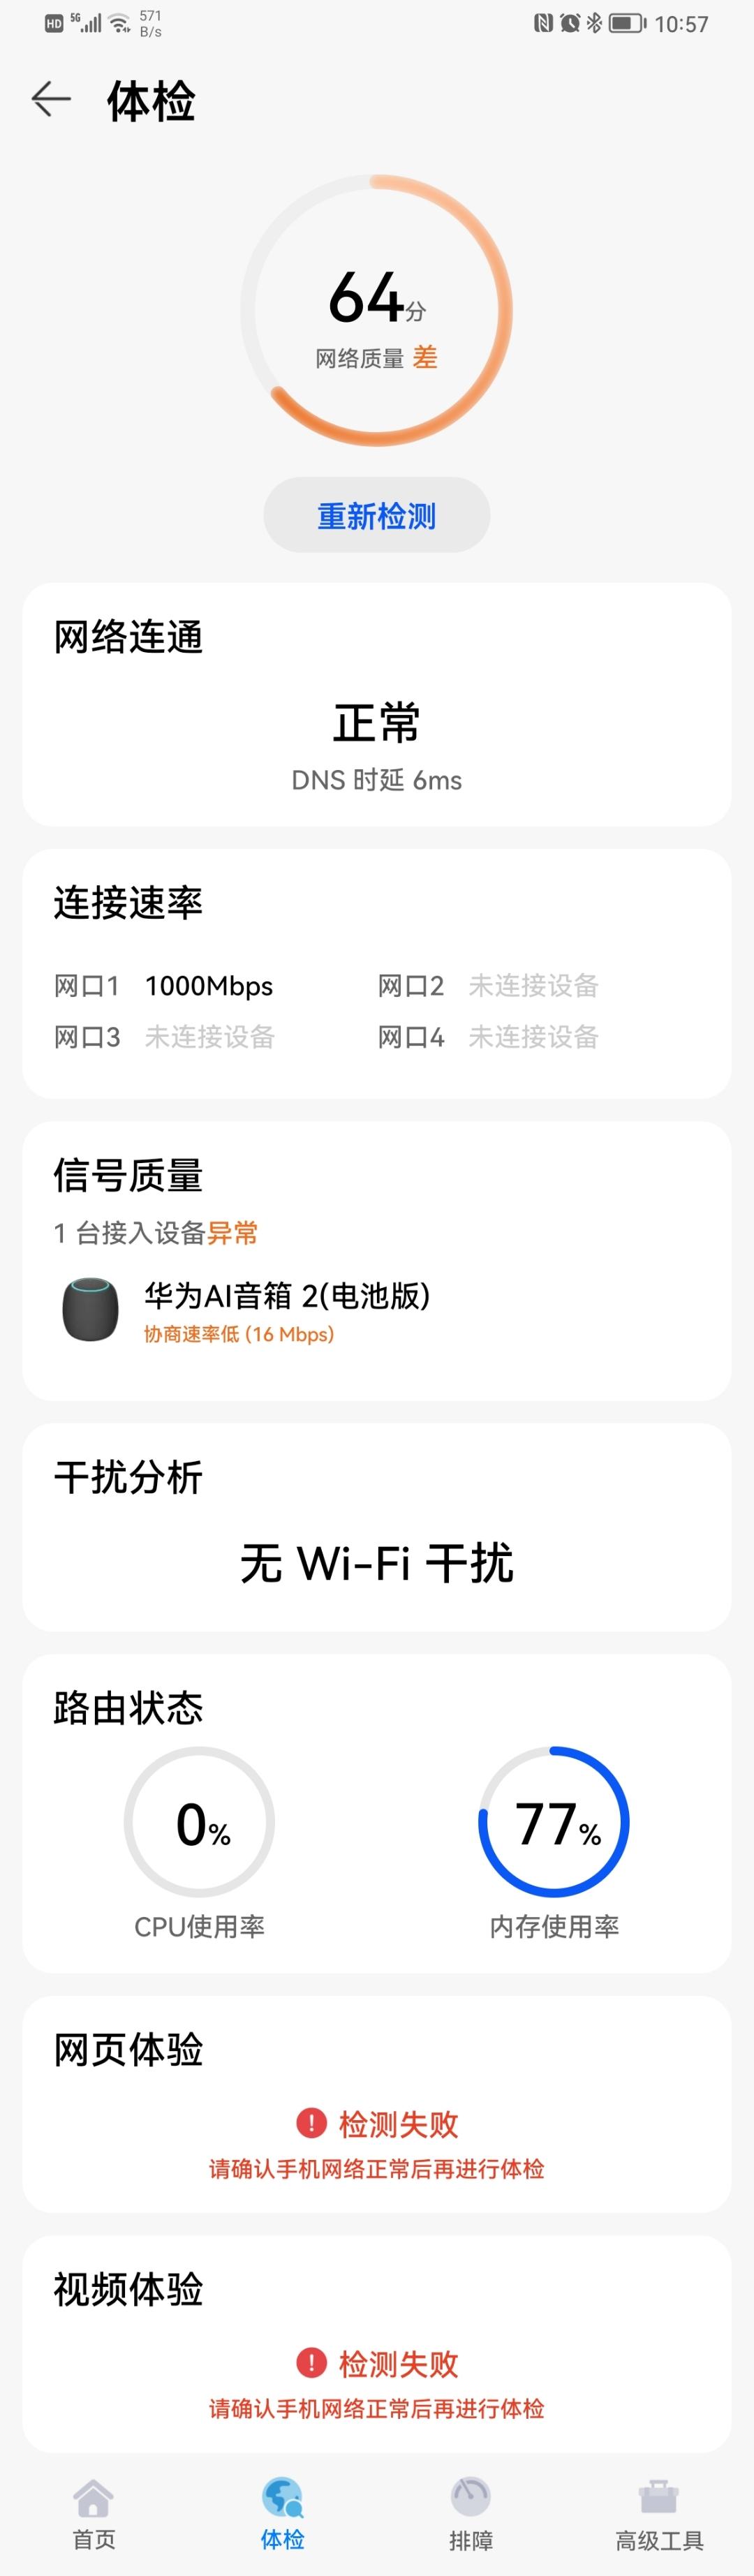 Screenshot_20210722_105704_com.huawei.smarthome.jpg